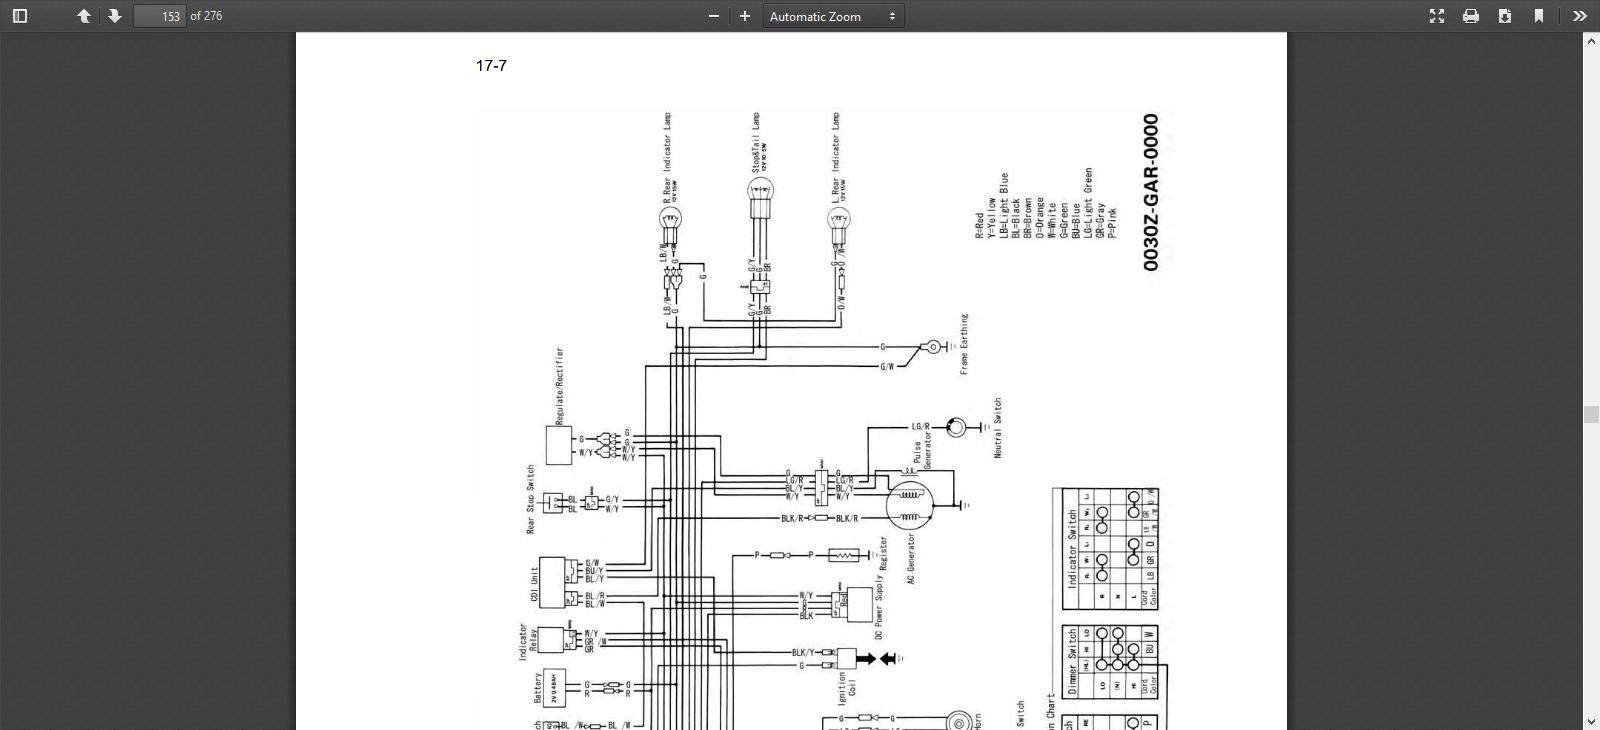 Screenshot_2020-05-20 z50j01 dar - Z50J Models pdf.png